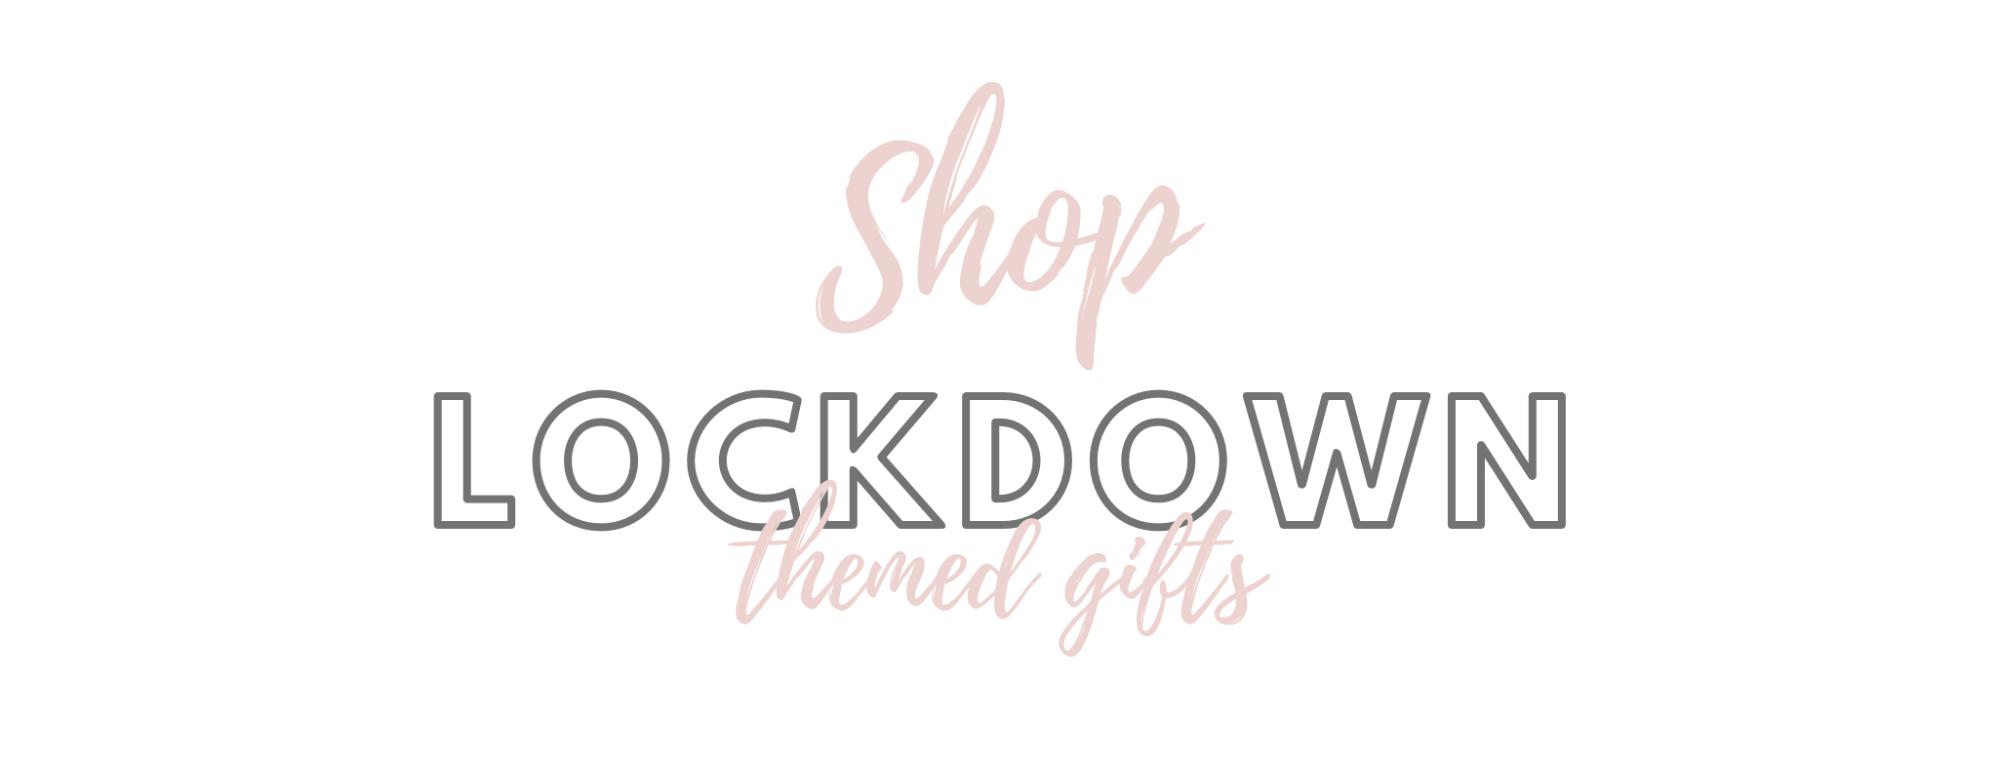 Shop Lockdown Themed